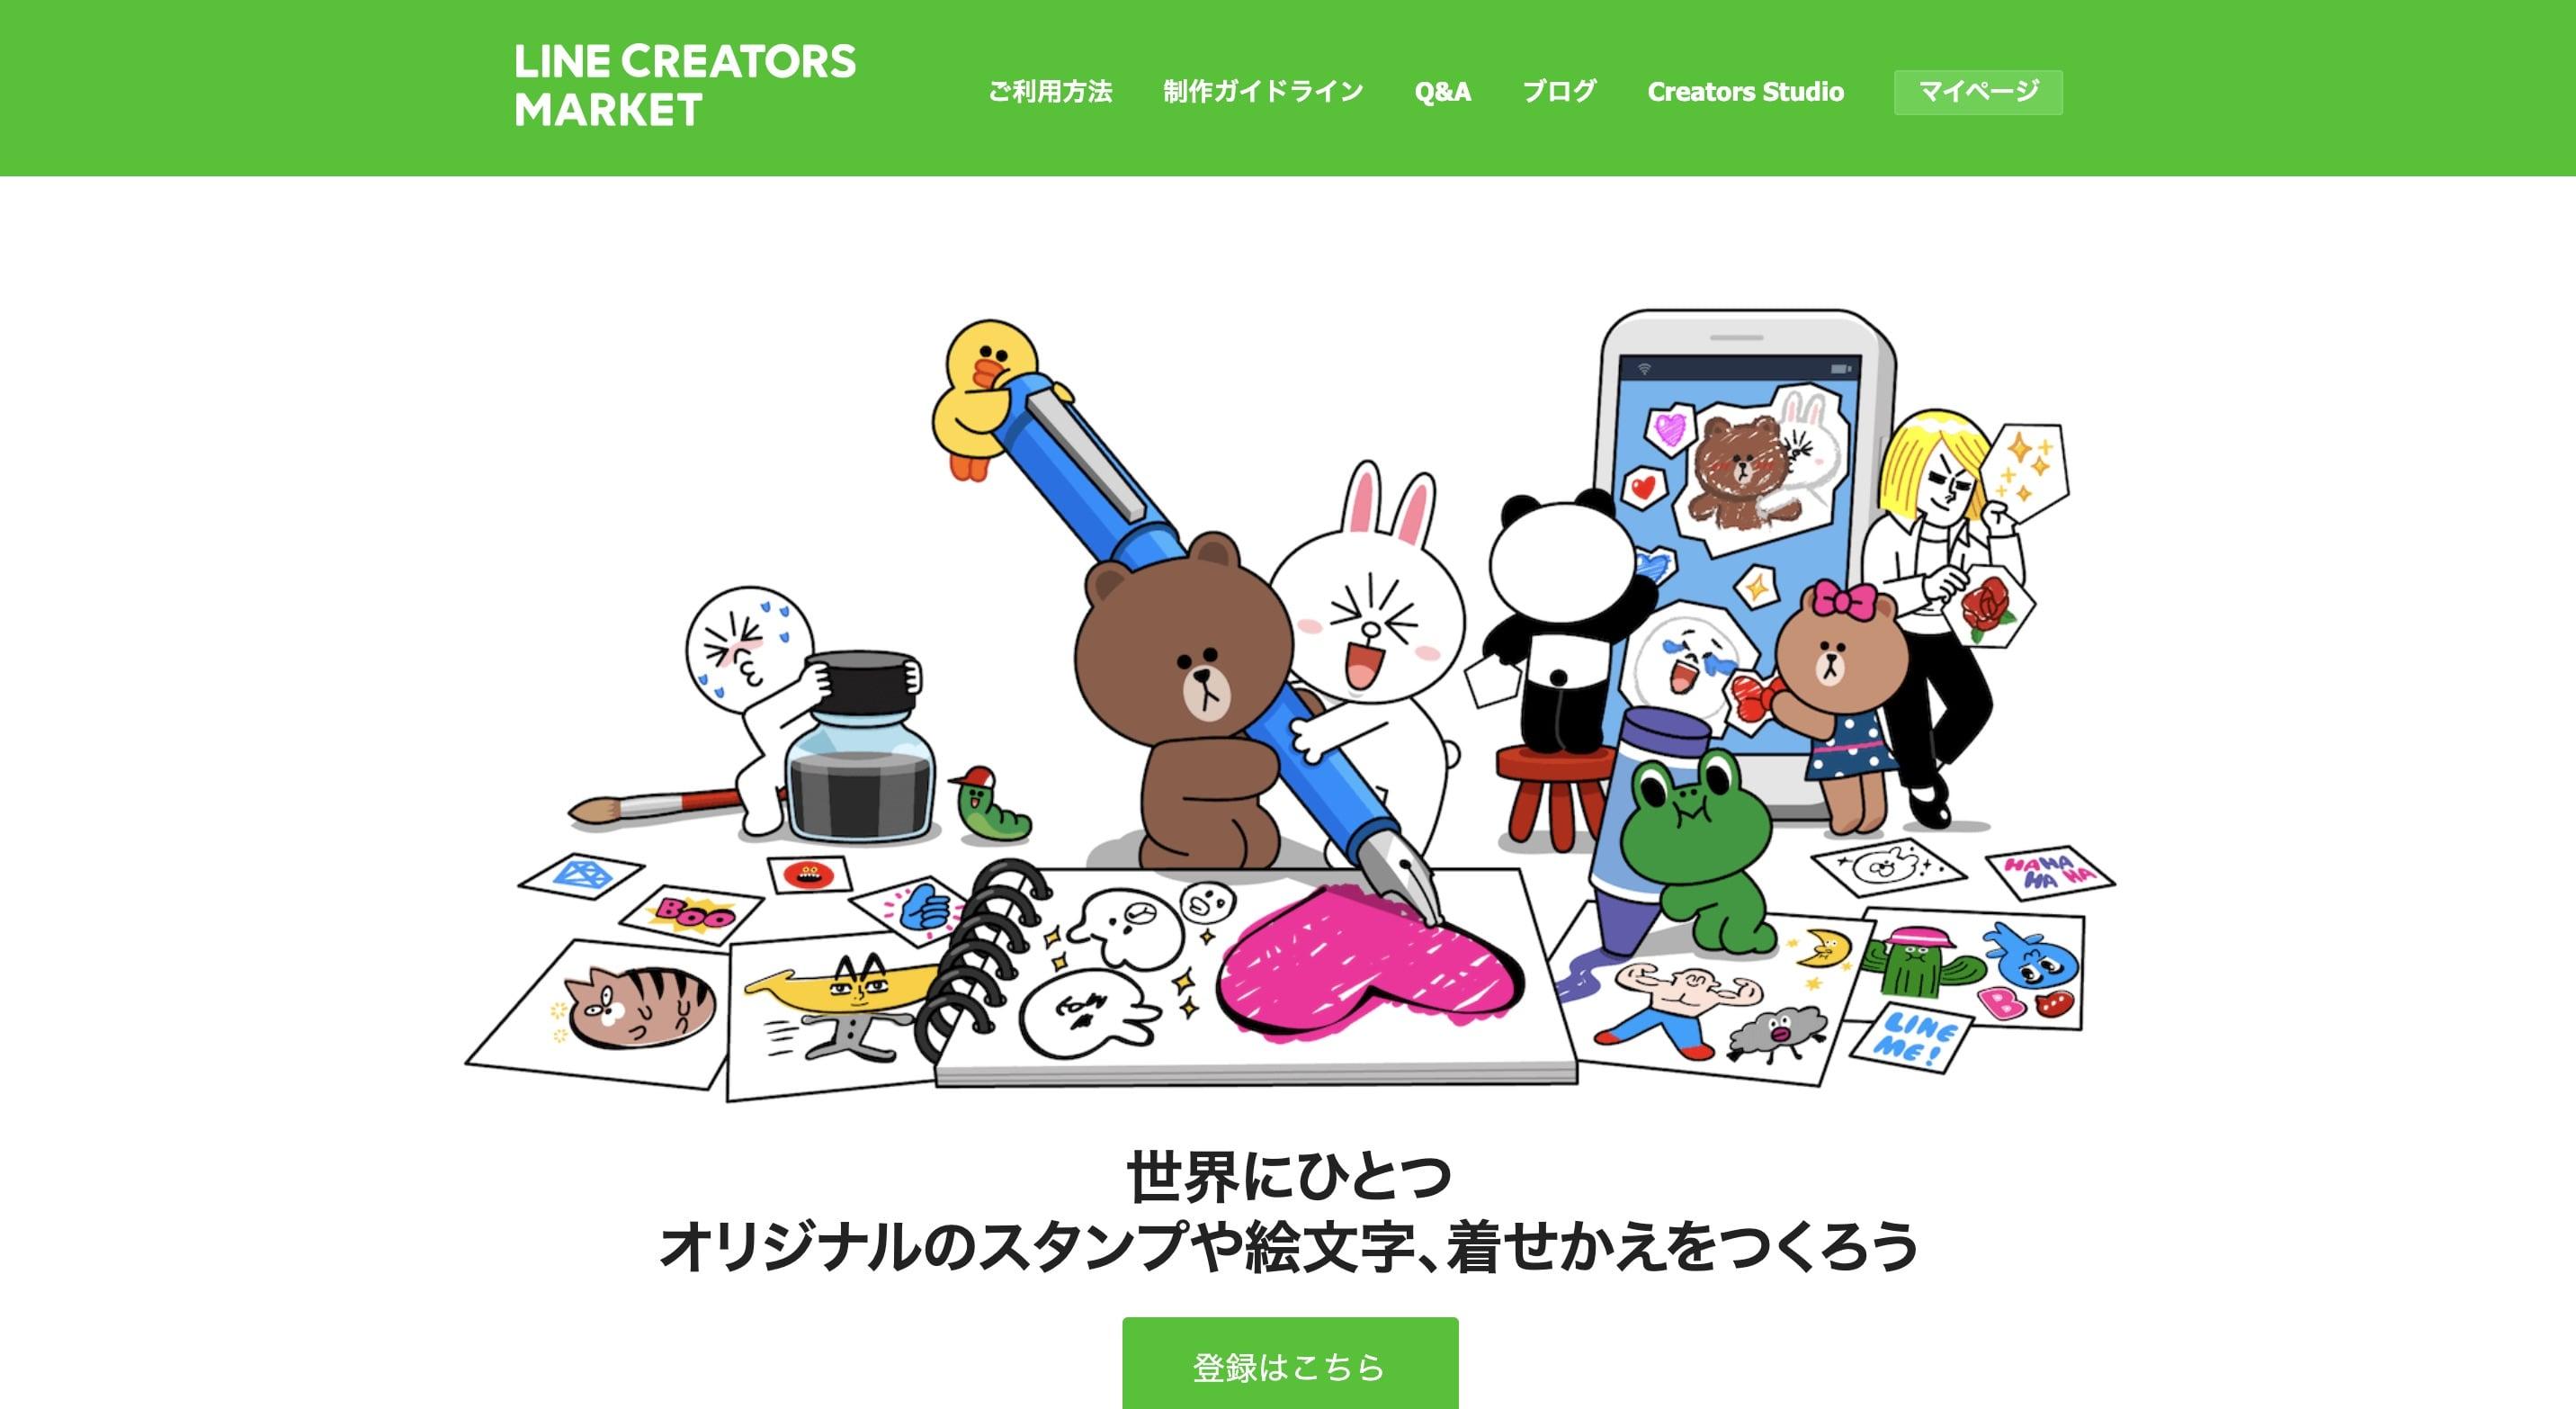 LINE Creators Market(ラインクリエイターズマーケット)のキャプチャ